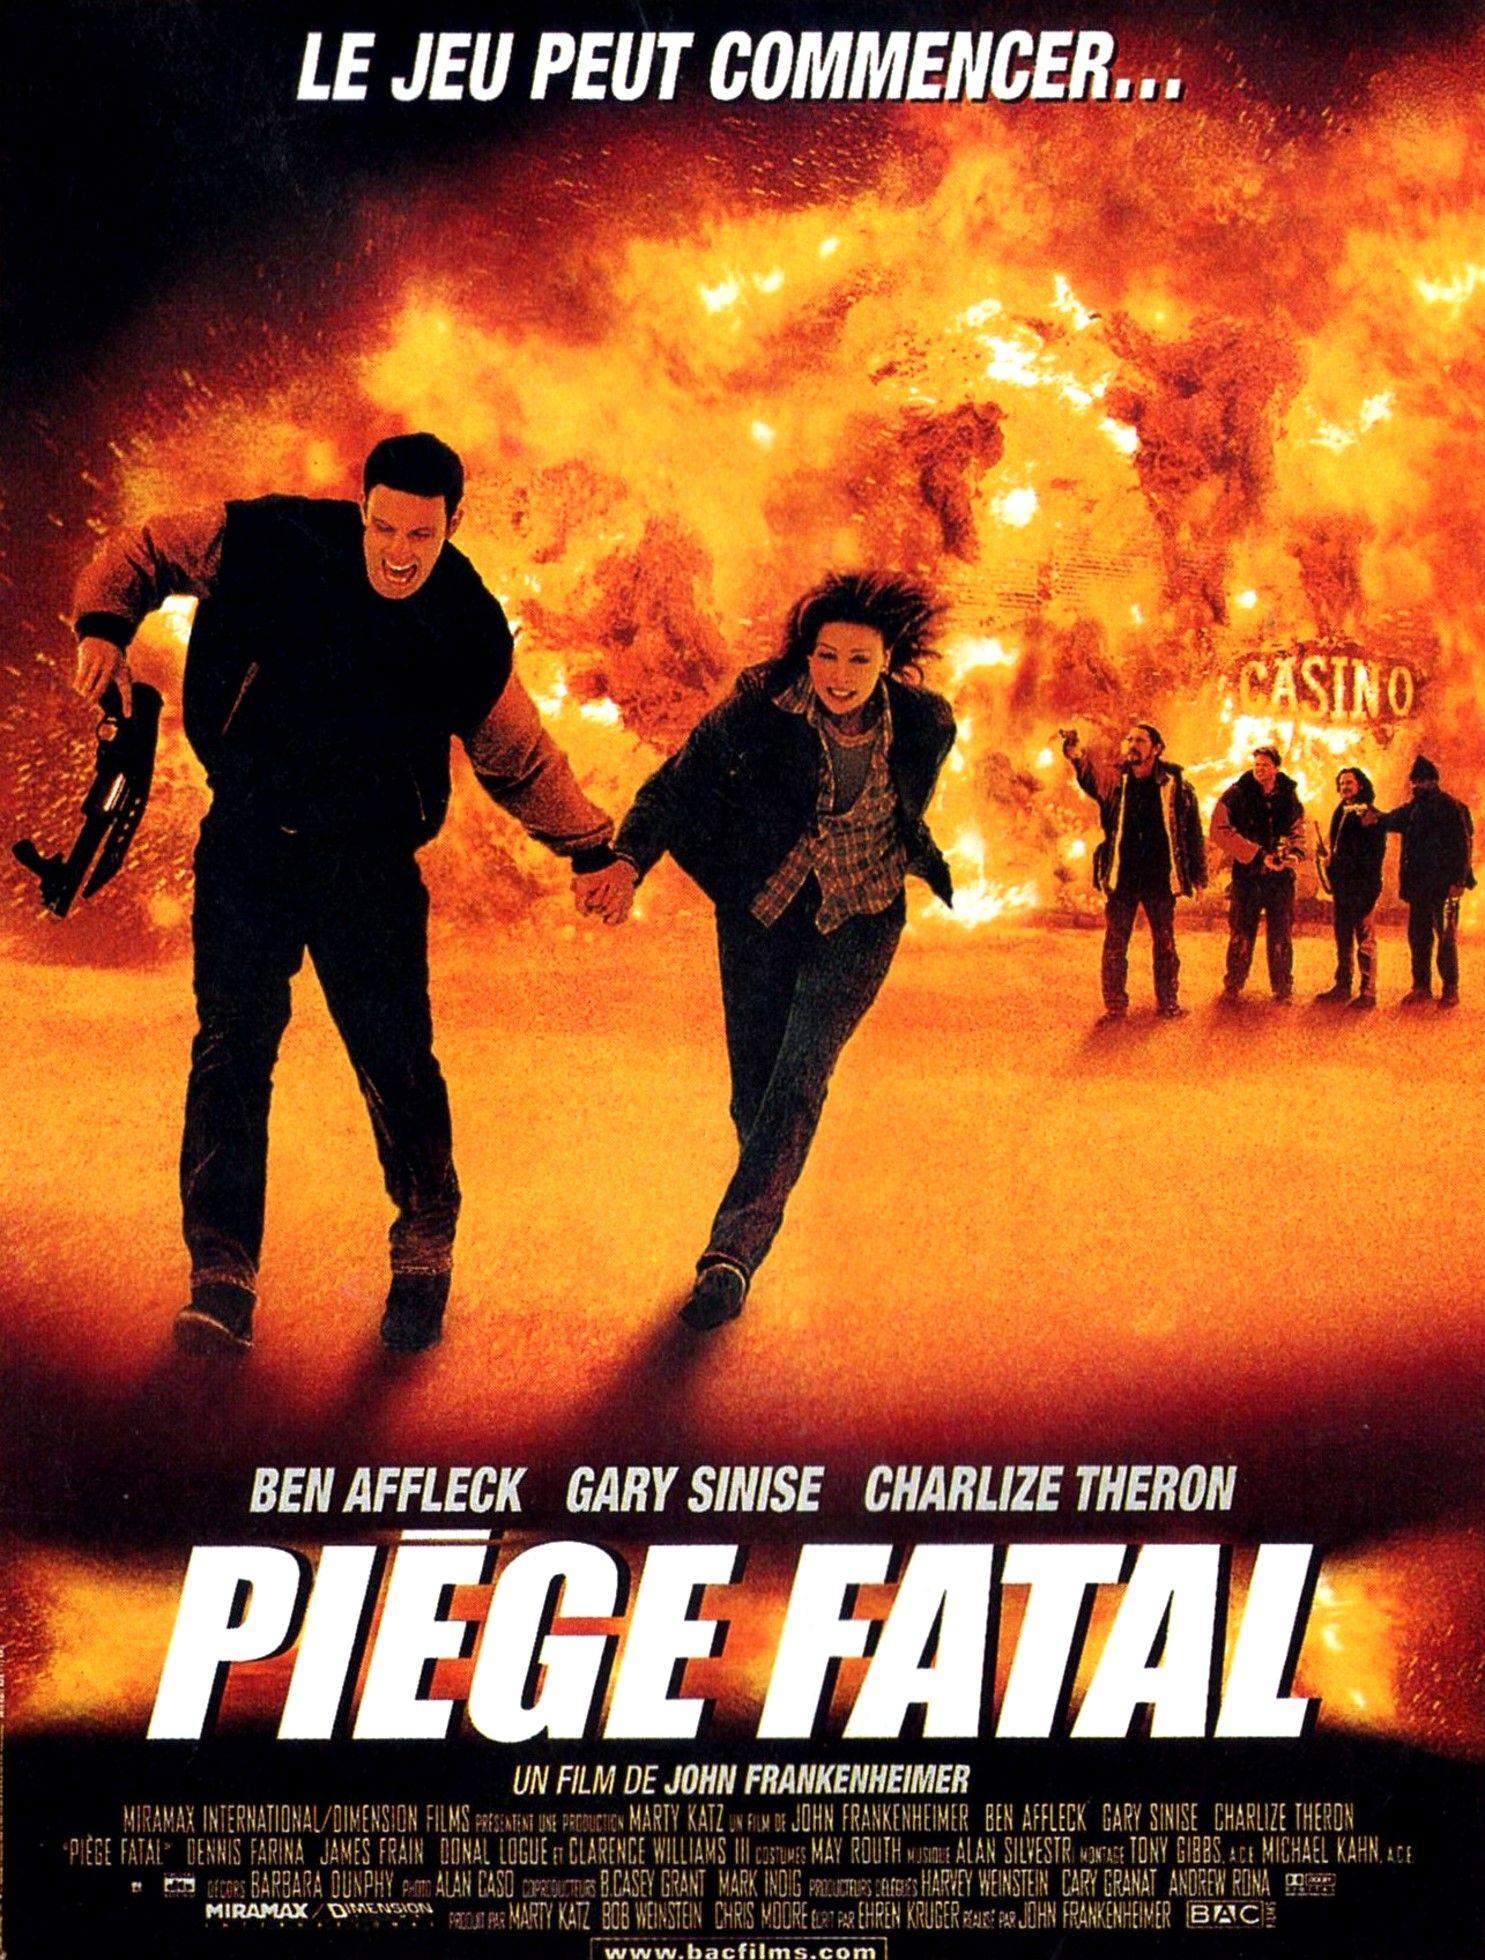 Piège fatal [Reindeer Games] - John Frankenheimer